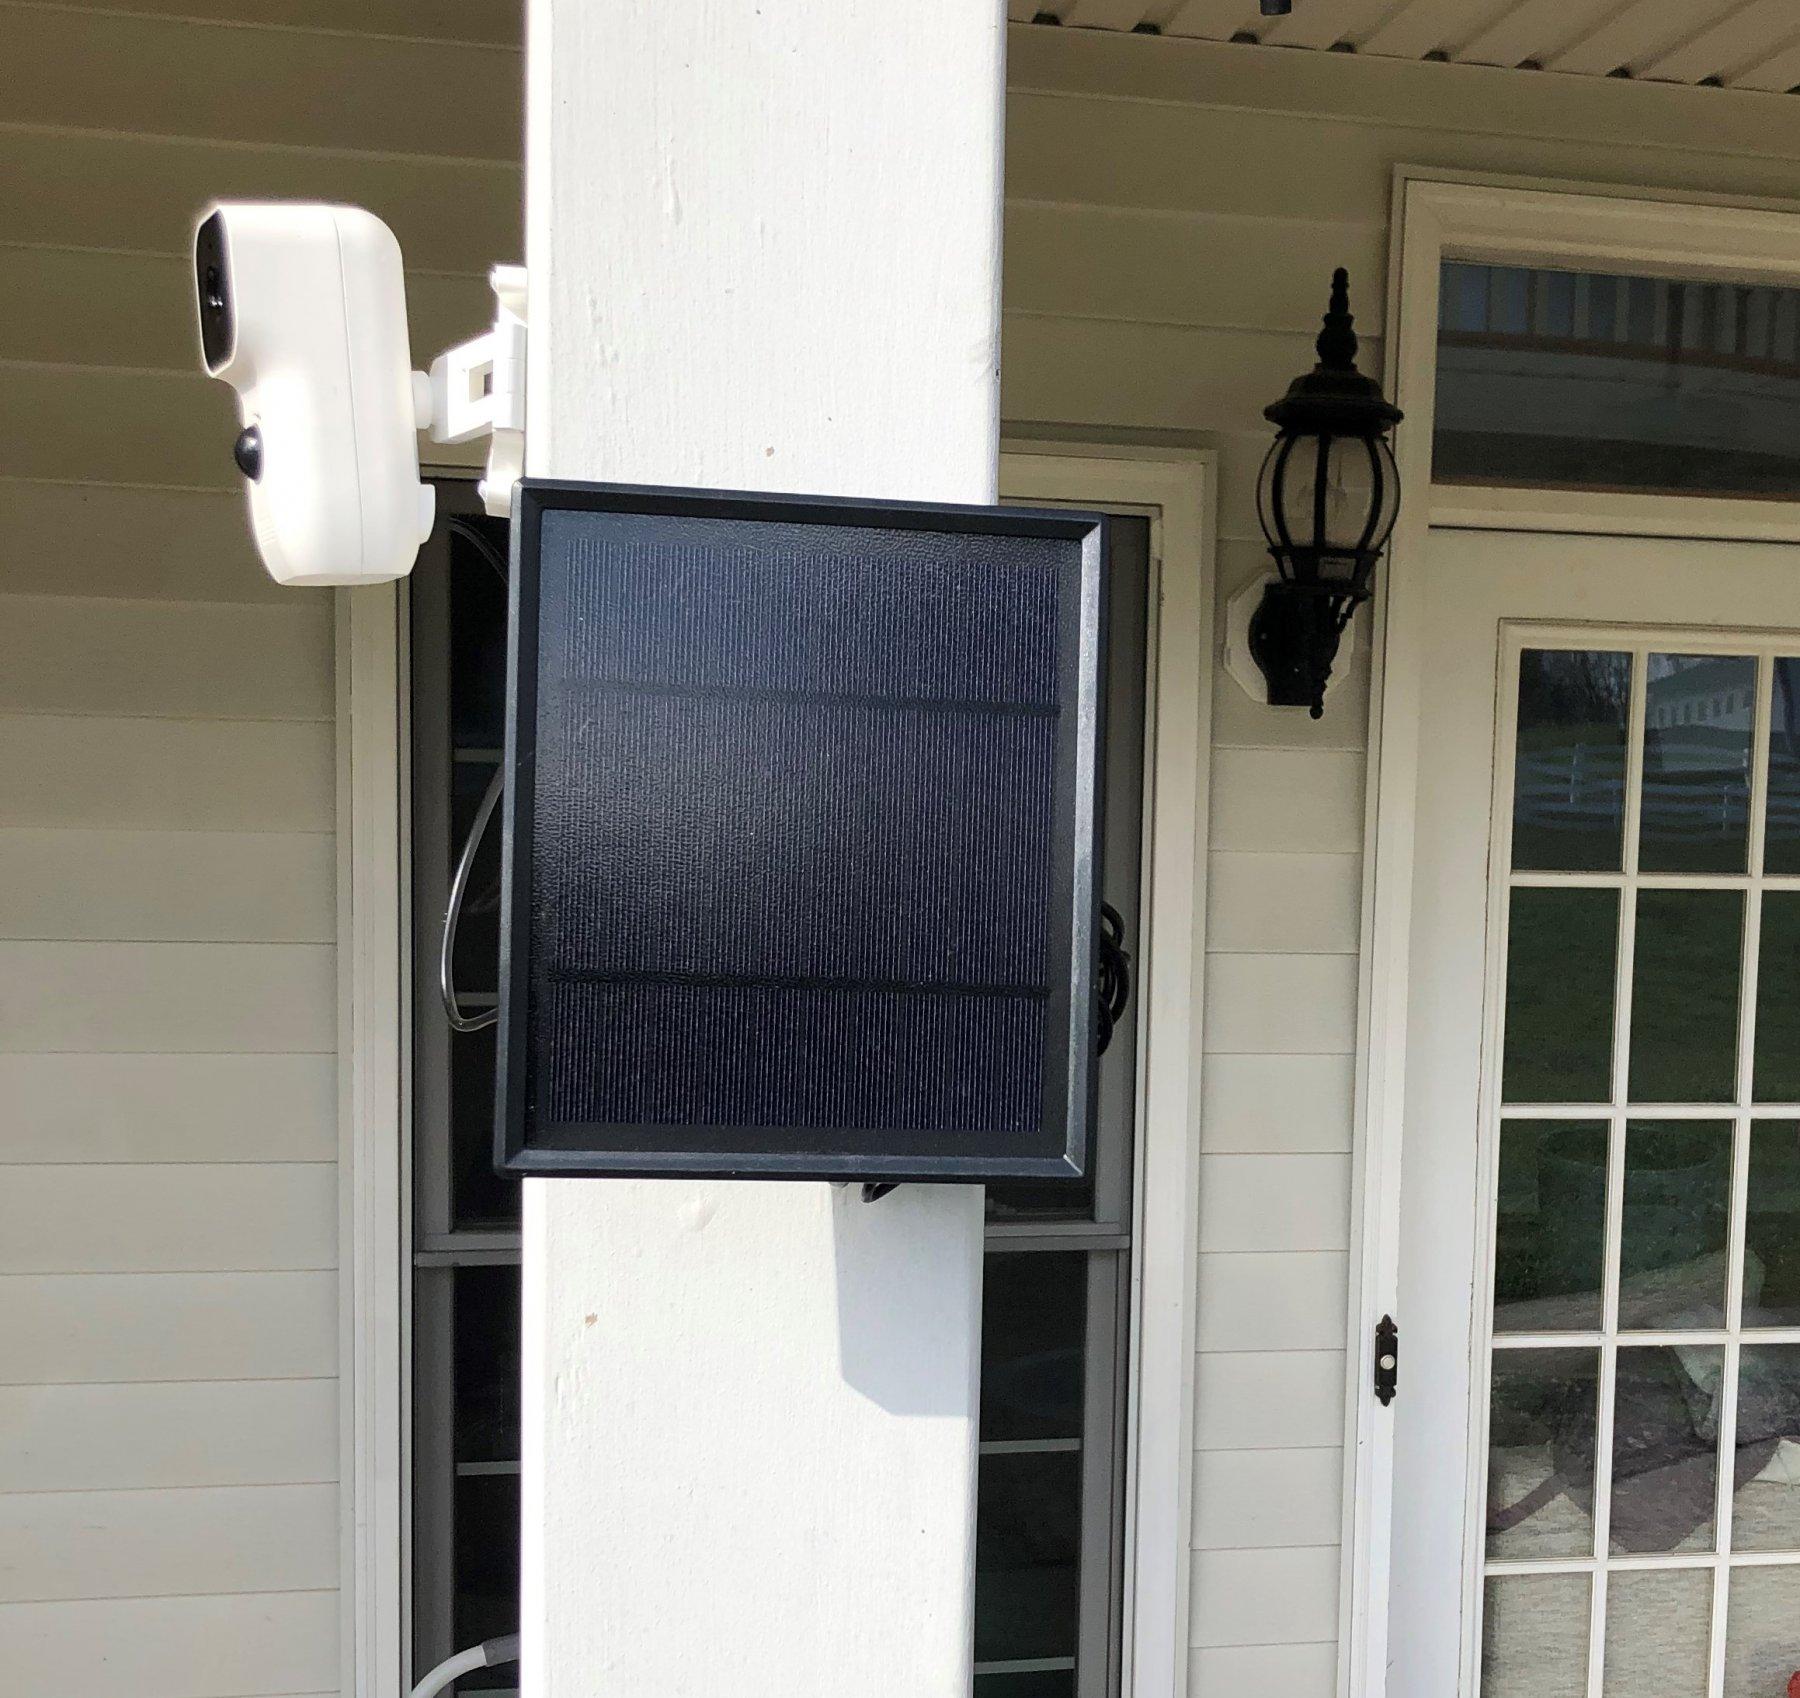 solar wireless outdoor security camera.jpg